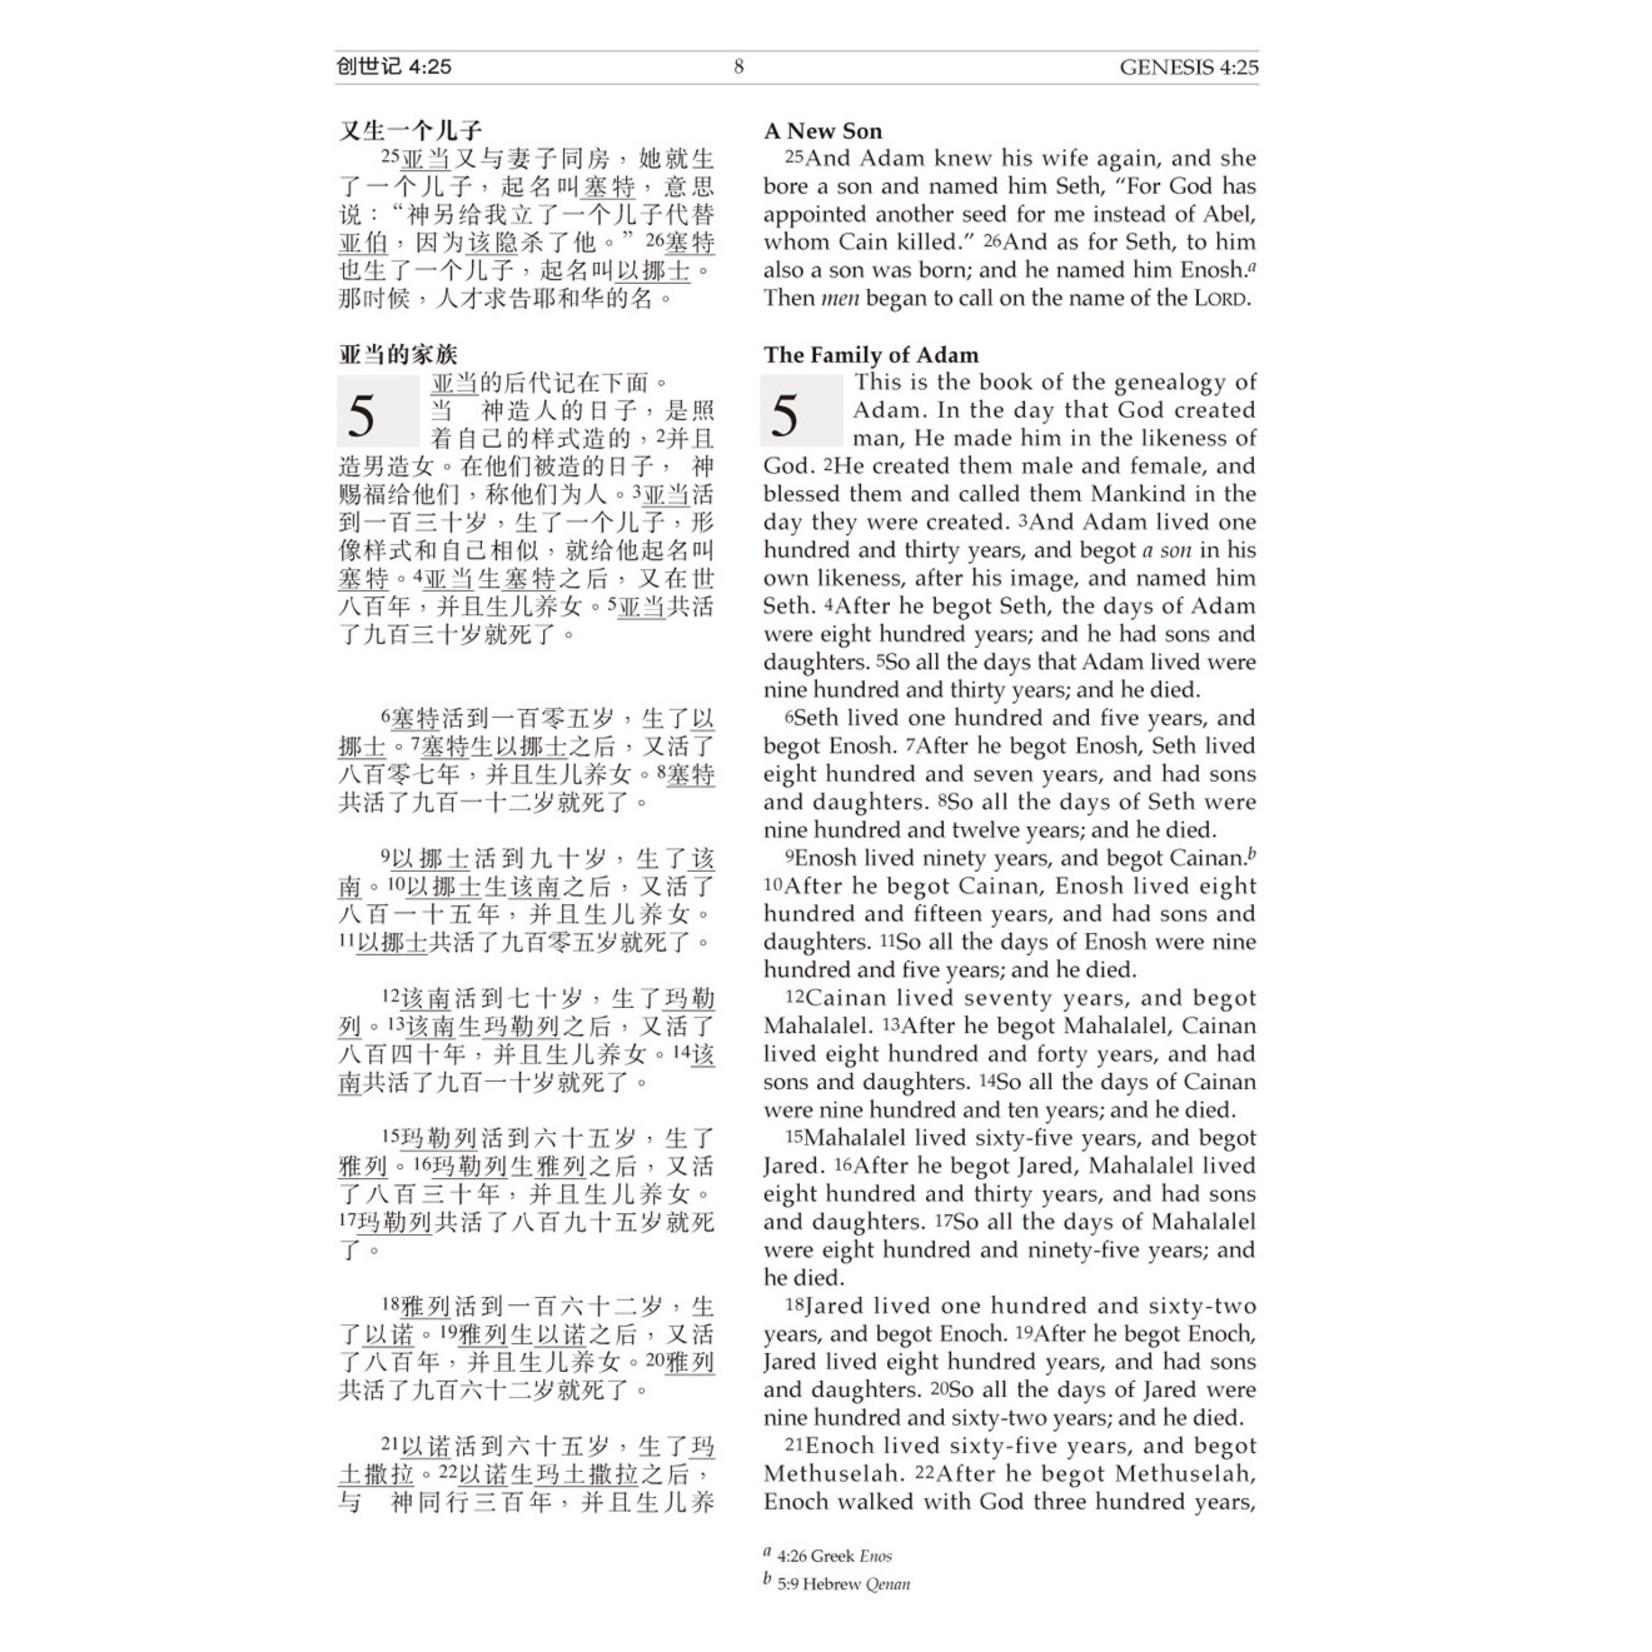 漢語聖經協會 Chinese Bible International 聖經.中英對照.和合本/NKJV.黑色仿皮面.金邊.標準本(簡體) Holy Bible - CUV / NKJV - Chinese / English (Black Leather Gilt Edge) Simplified Chinese